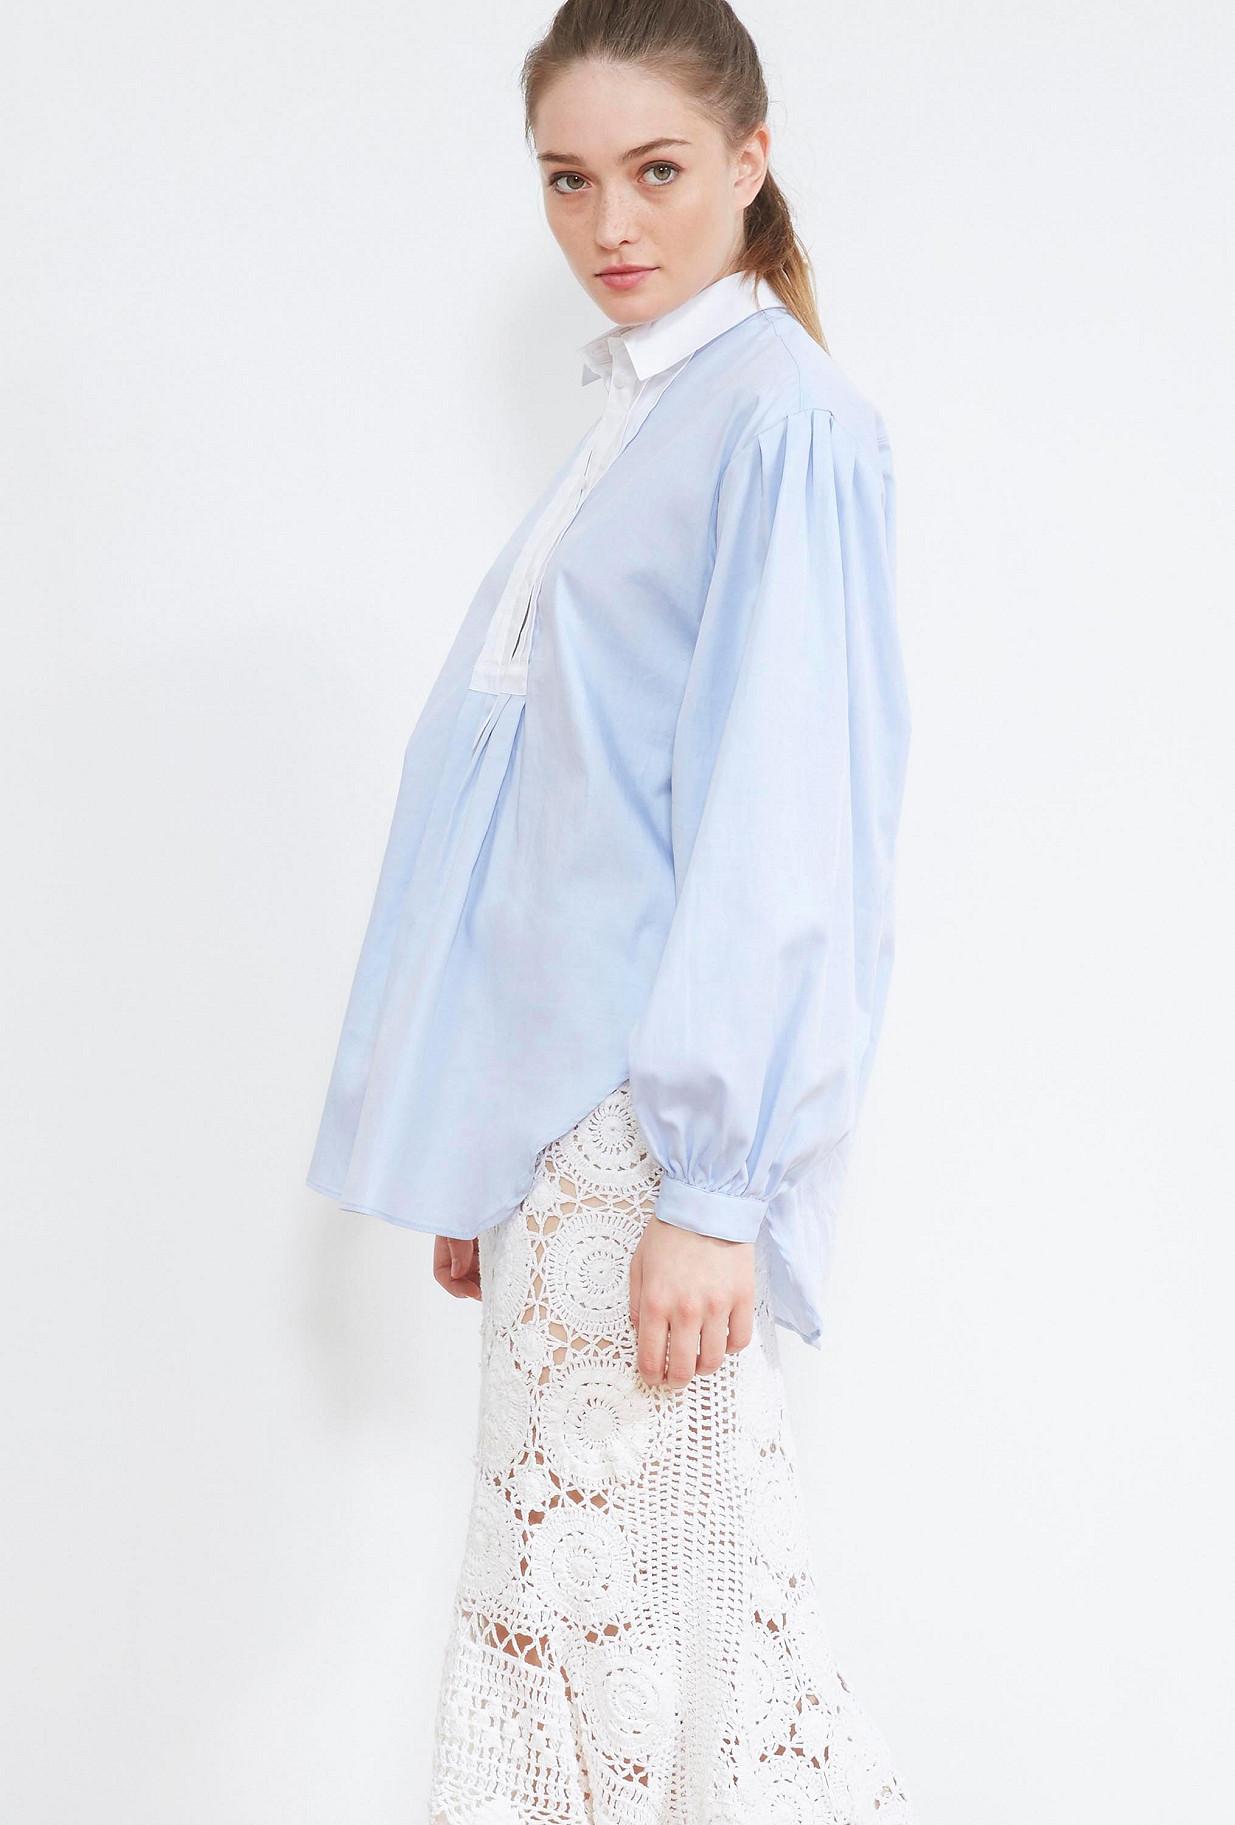 BLOUSE Bleu ciel Milka